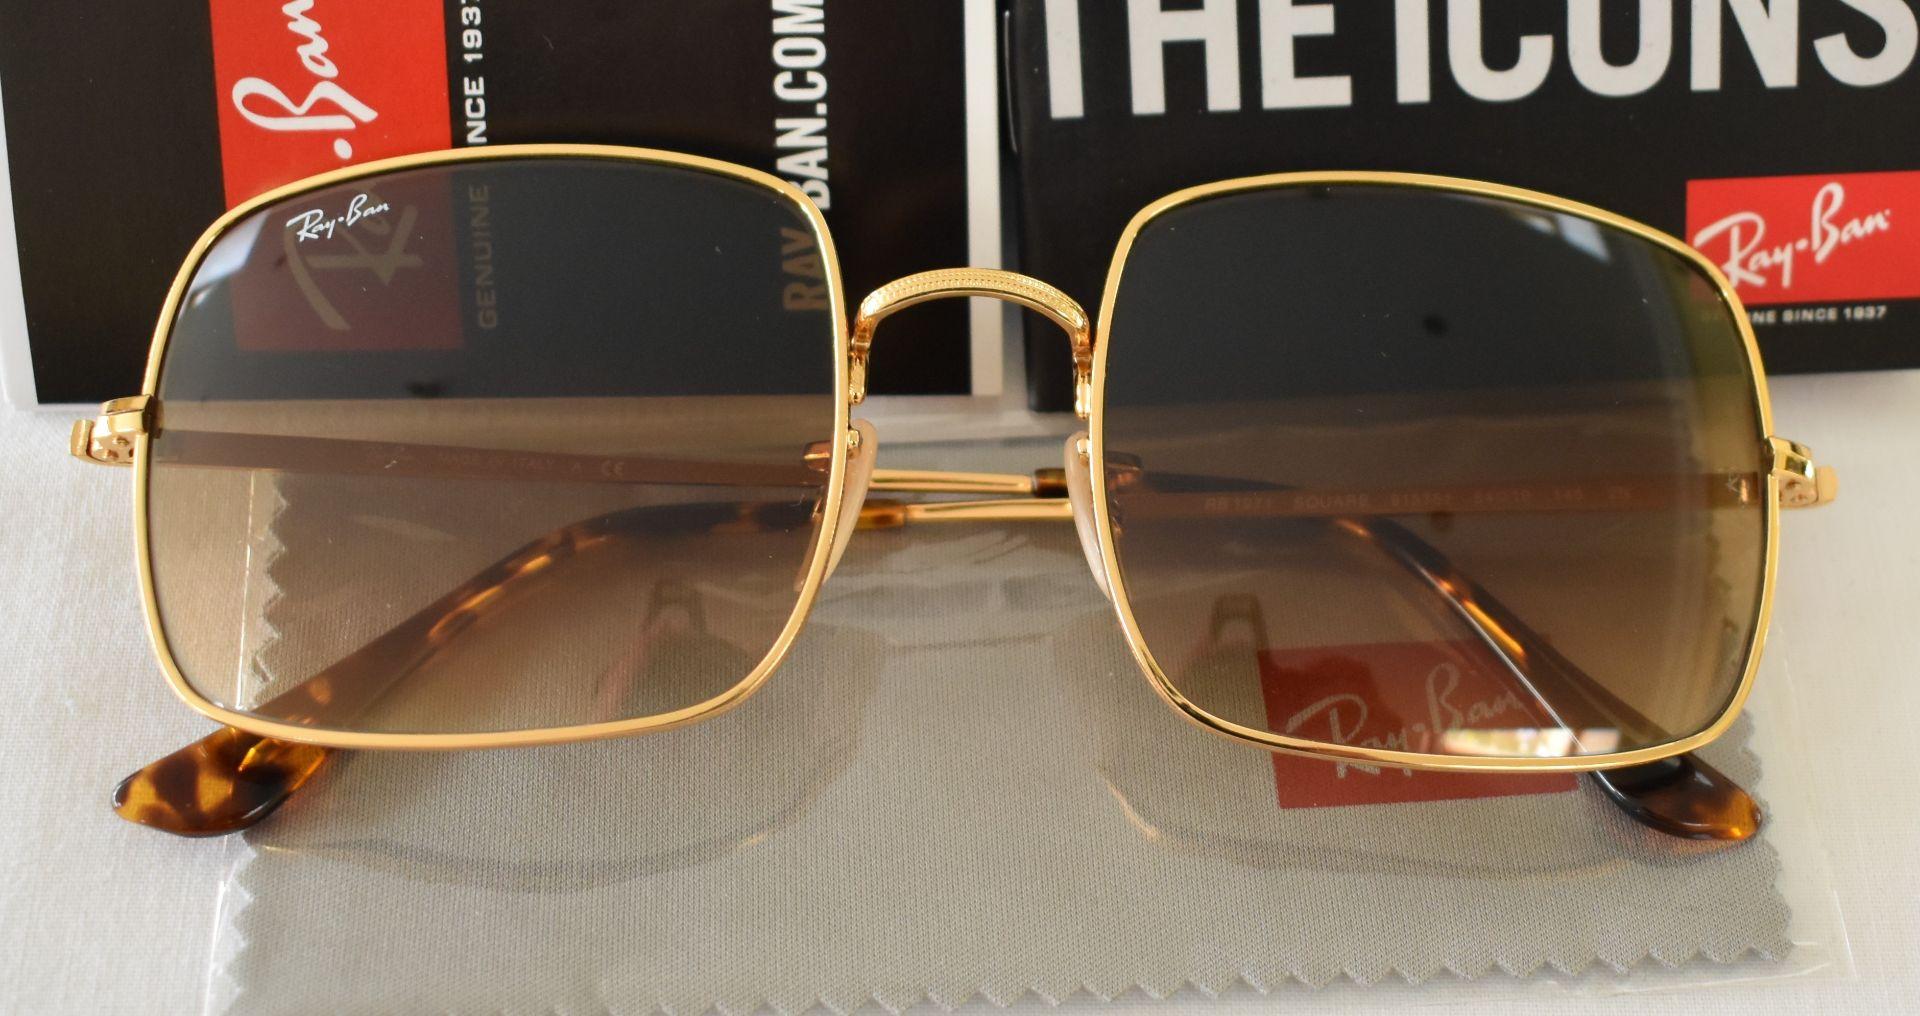 Ray Ban Sunglasses ORB1971 915751 *2N - Image 2 of 3